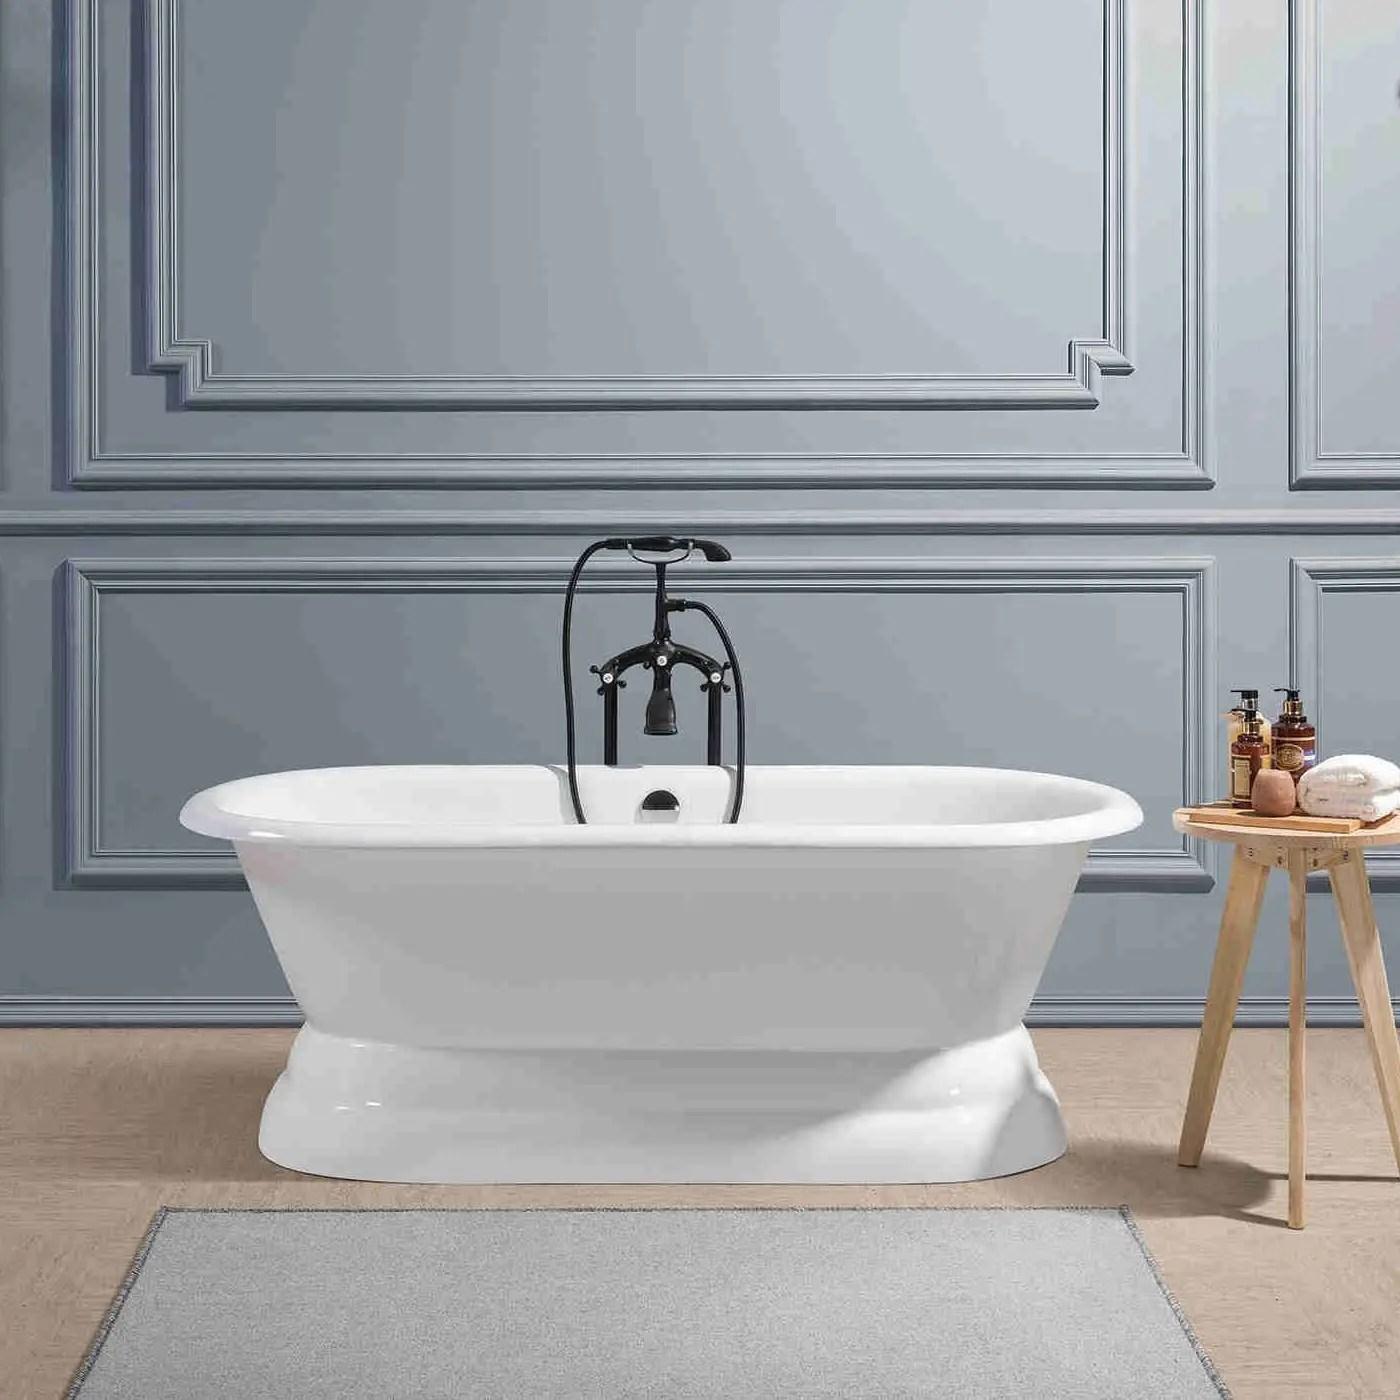 Porcelain Sink Refinishing Product